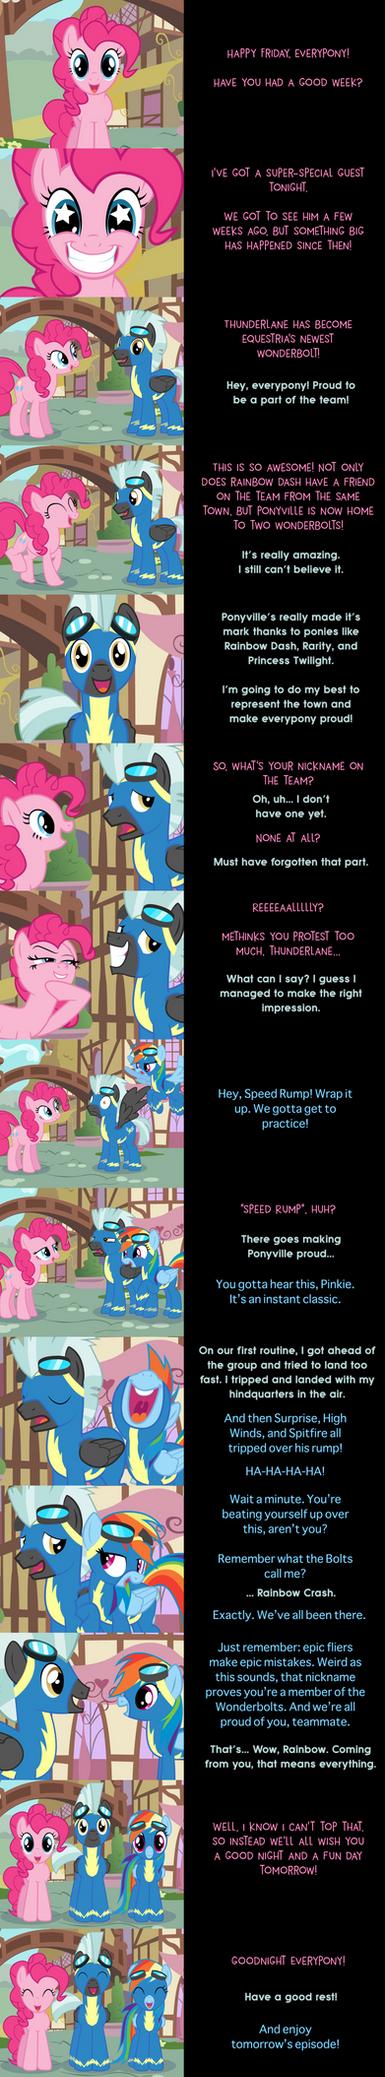 Pinkie Pie Says Goodnight: Wonder Blunder by MLP-Silver-Quill